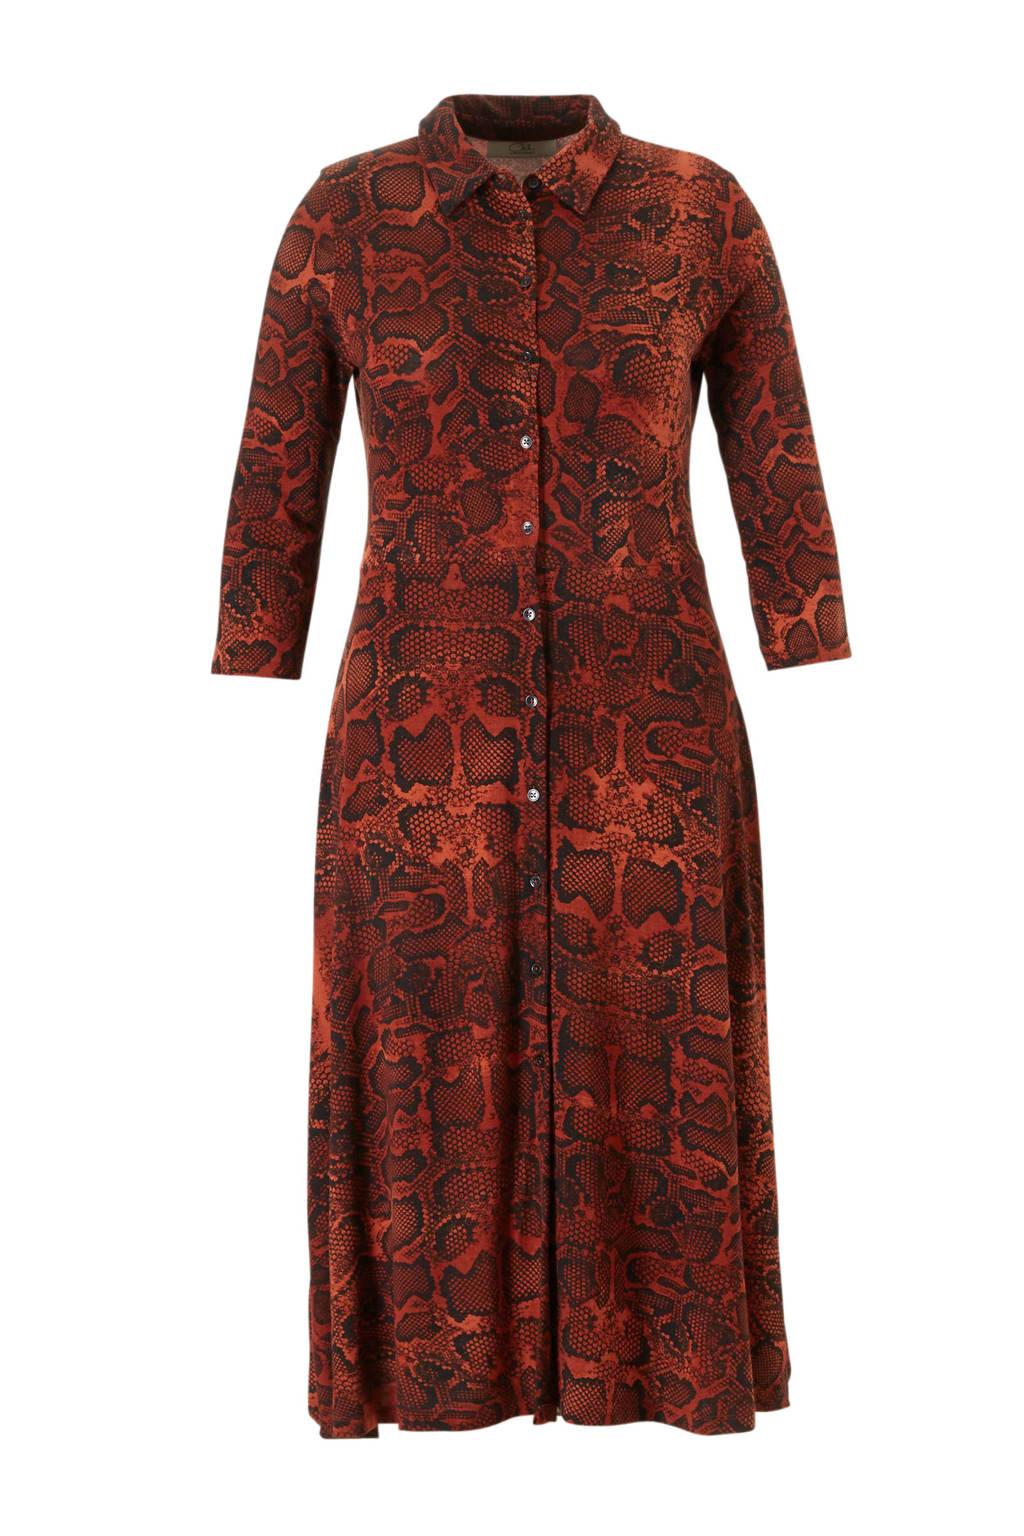 C&A XL Clockhouse blousejurk met slangenprint rood, Rood/zwart